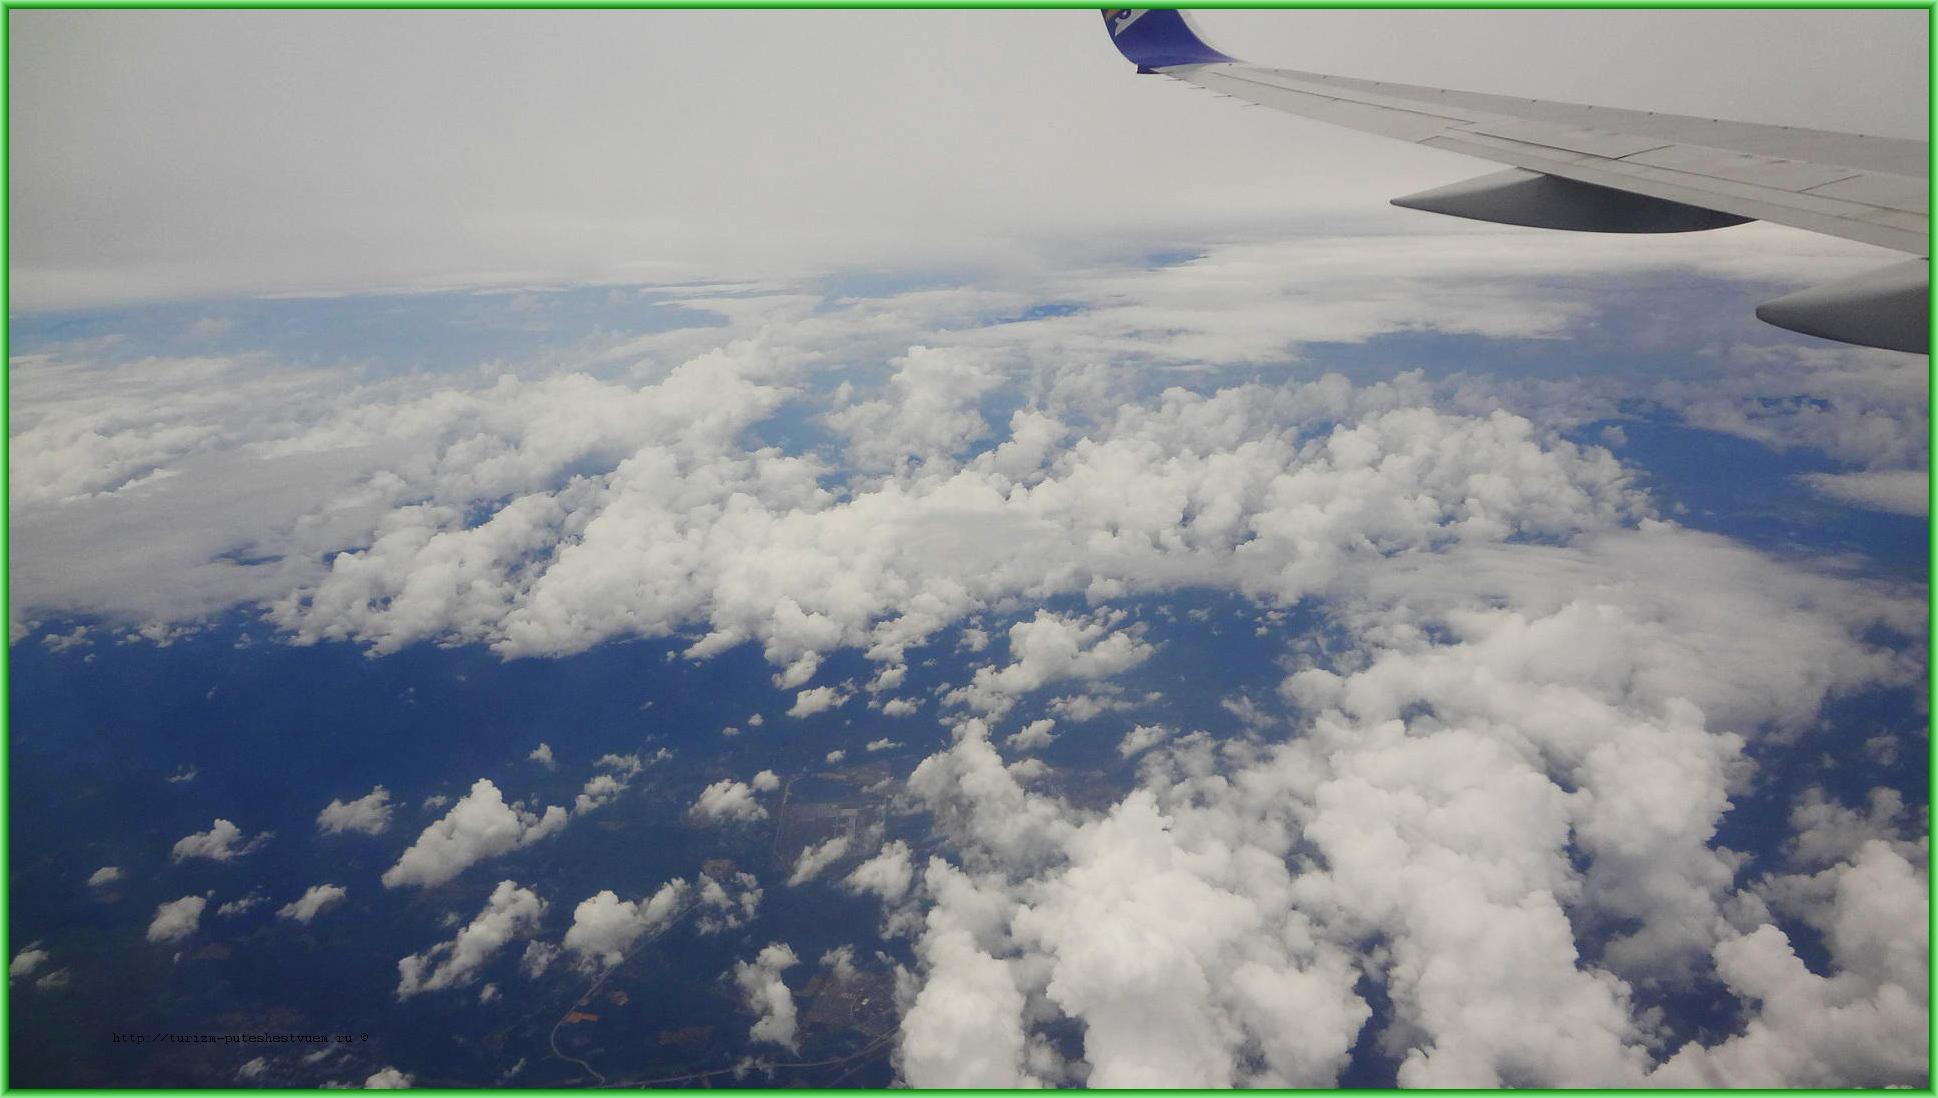 Вид из самолёта - все дешёвые авиакомпании мира - vse-deshyovye-aviakompanii-mira